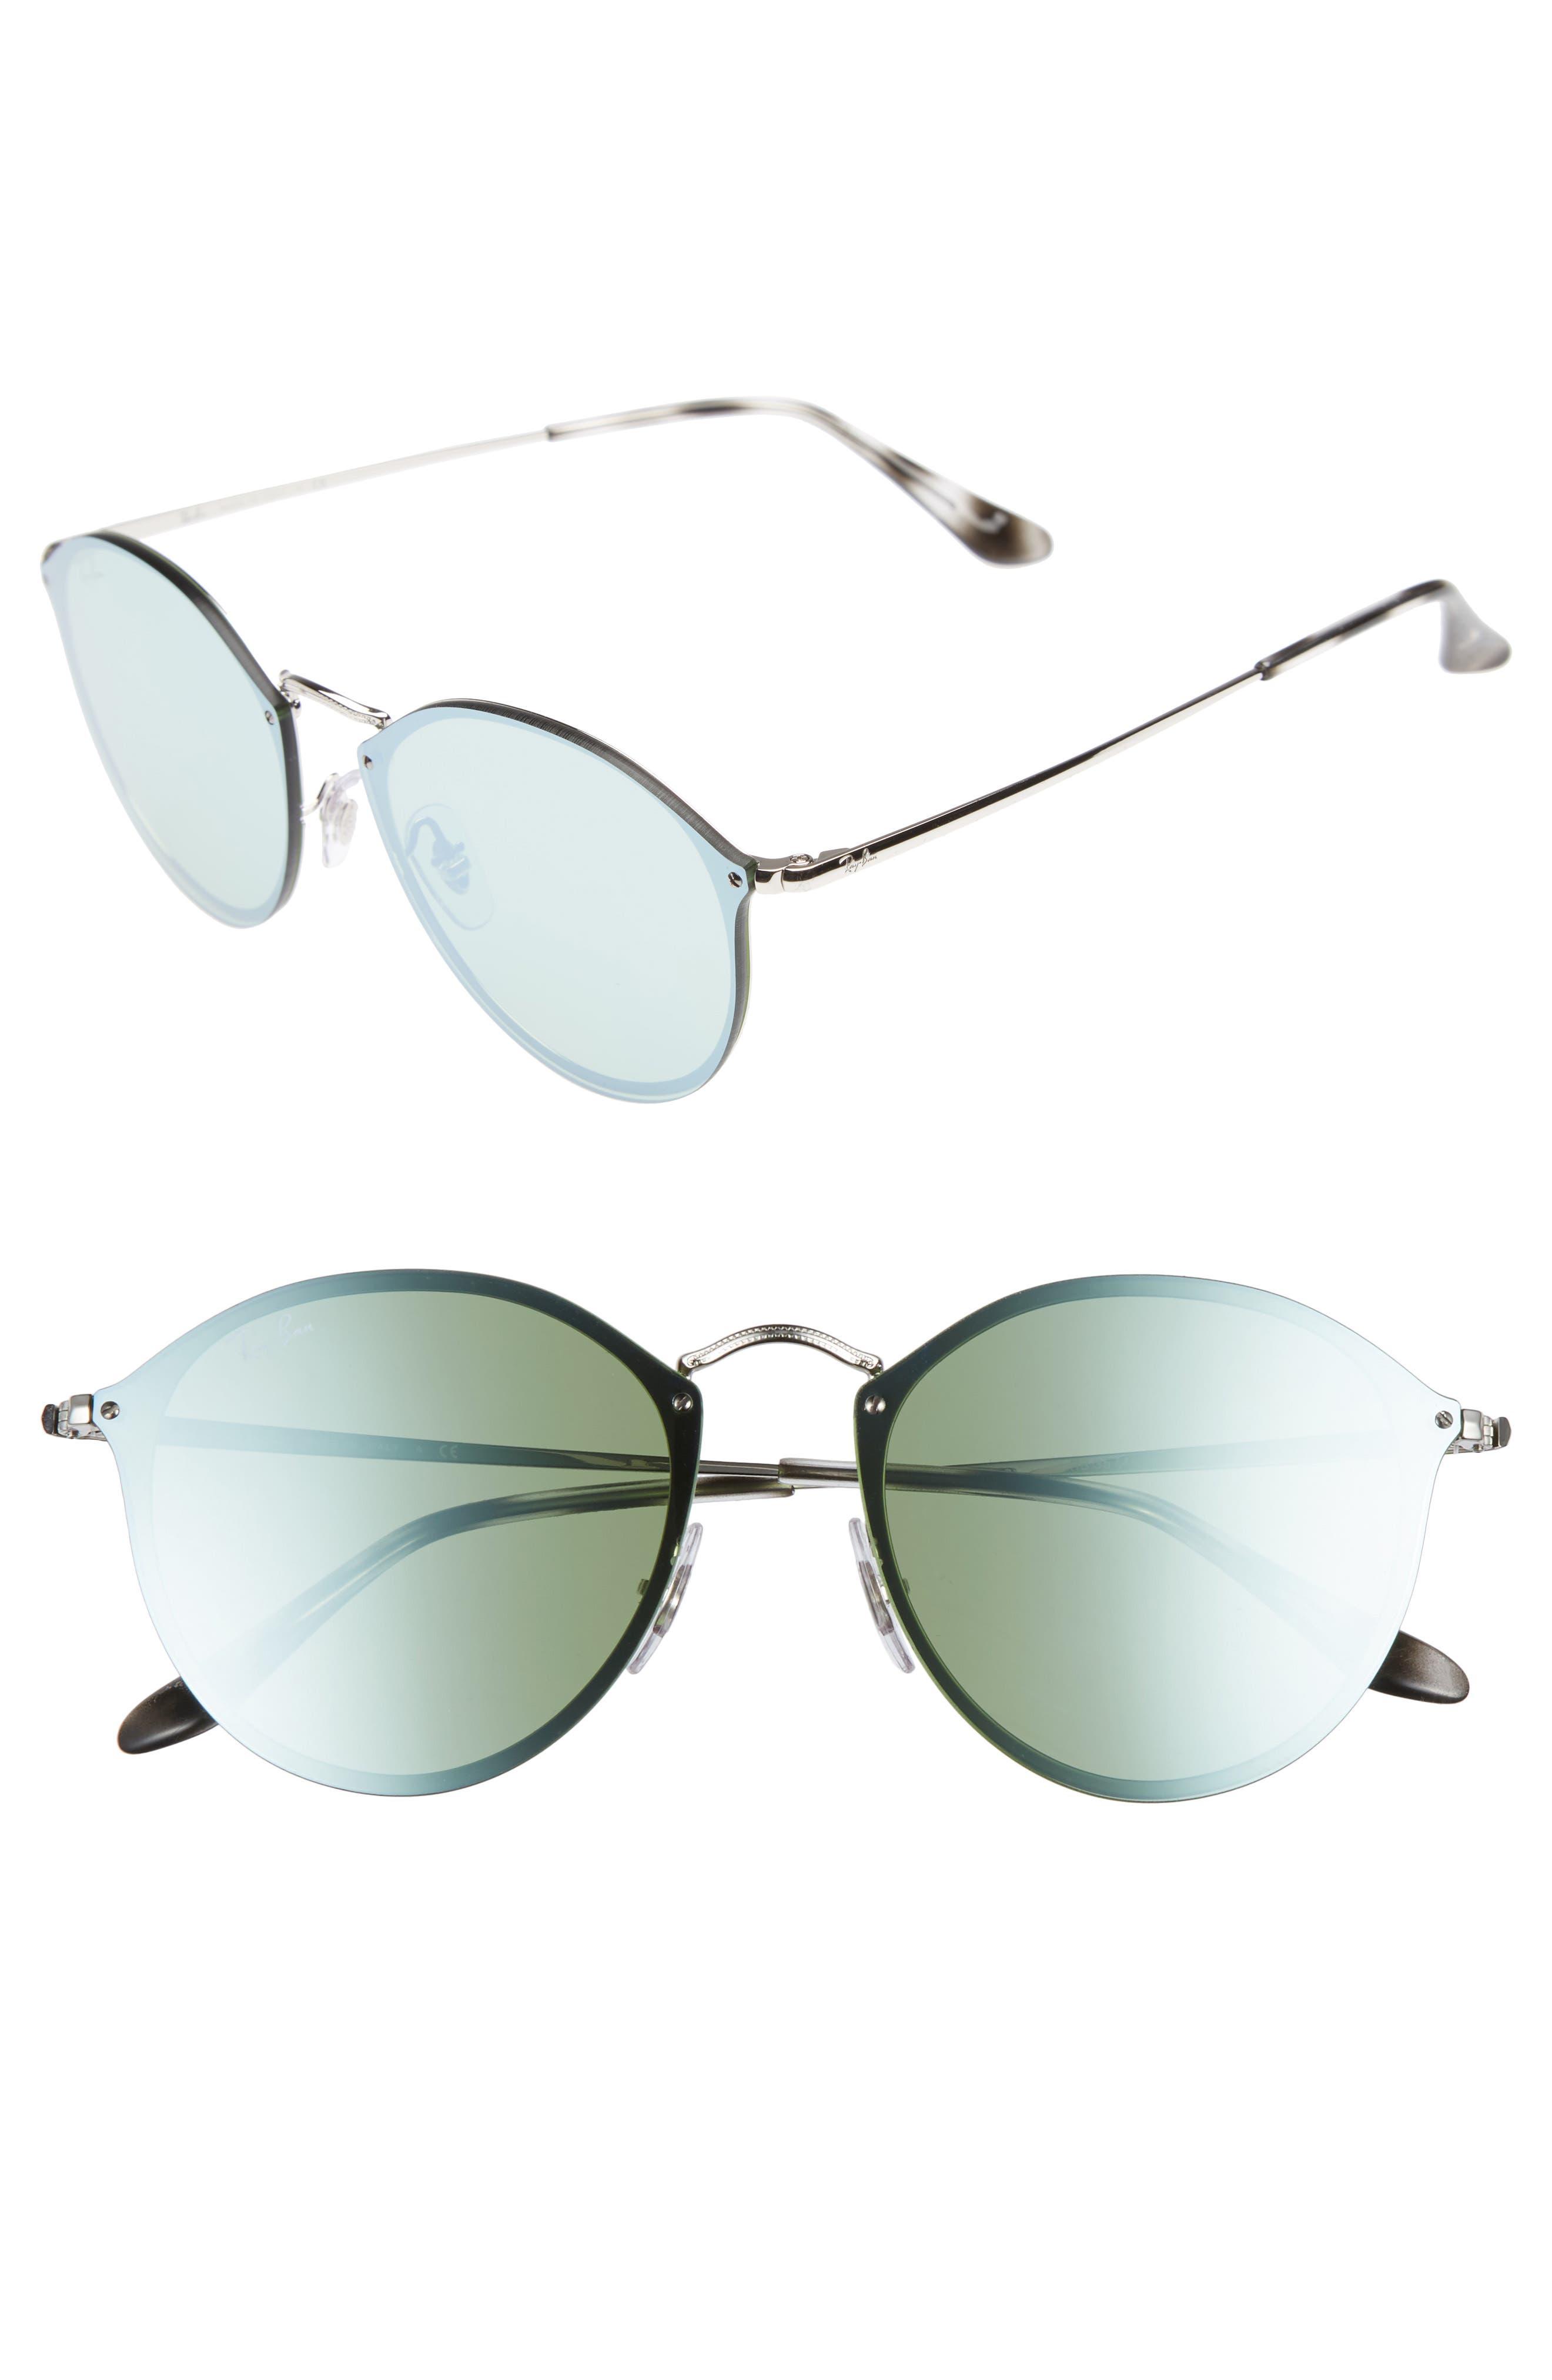 59mm Round Sunglasses,                             Main thumbnail 1, color,                             041